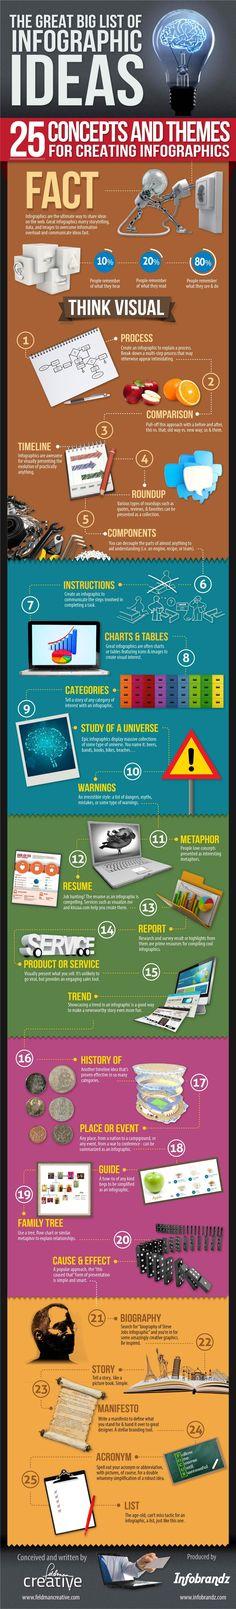 The Great Big List of Infographics Ideas by Barry Feldman via slideshare